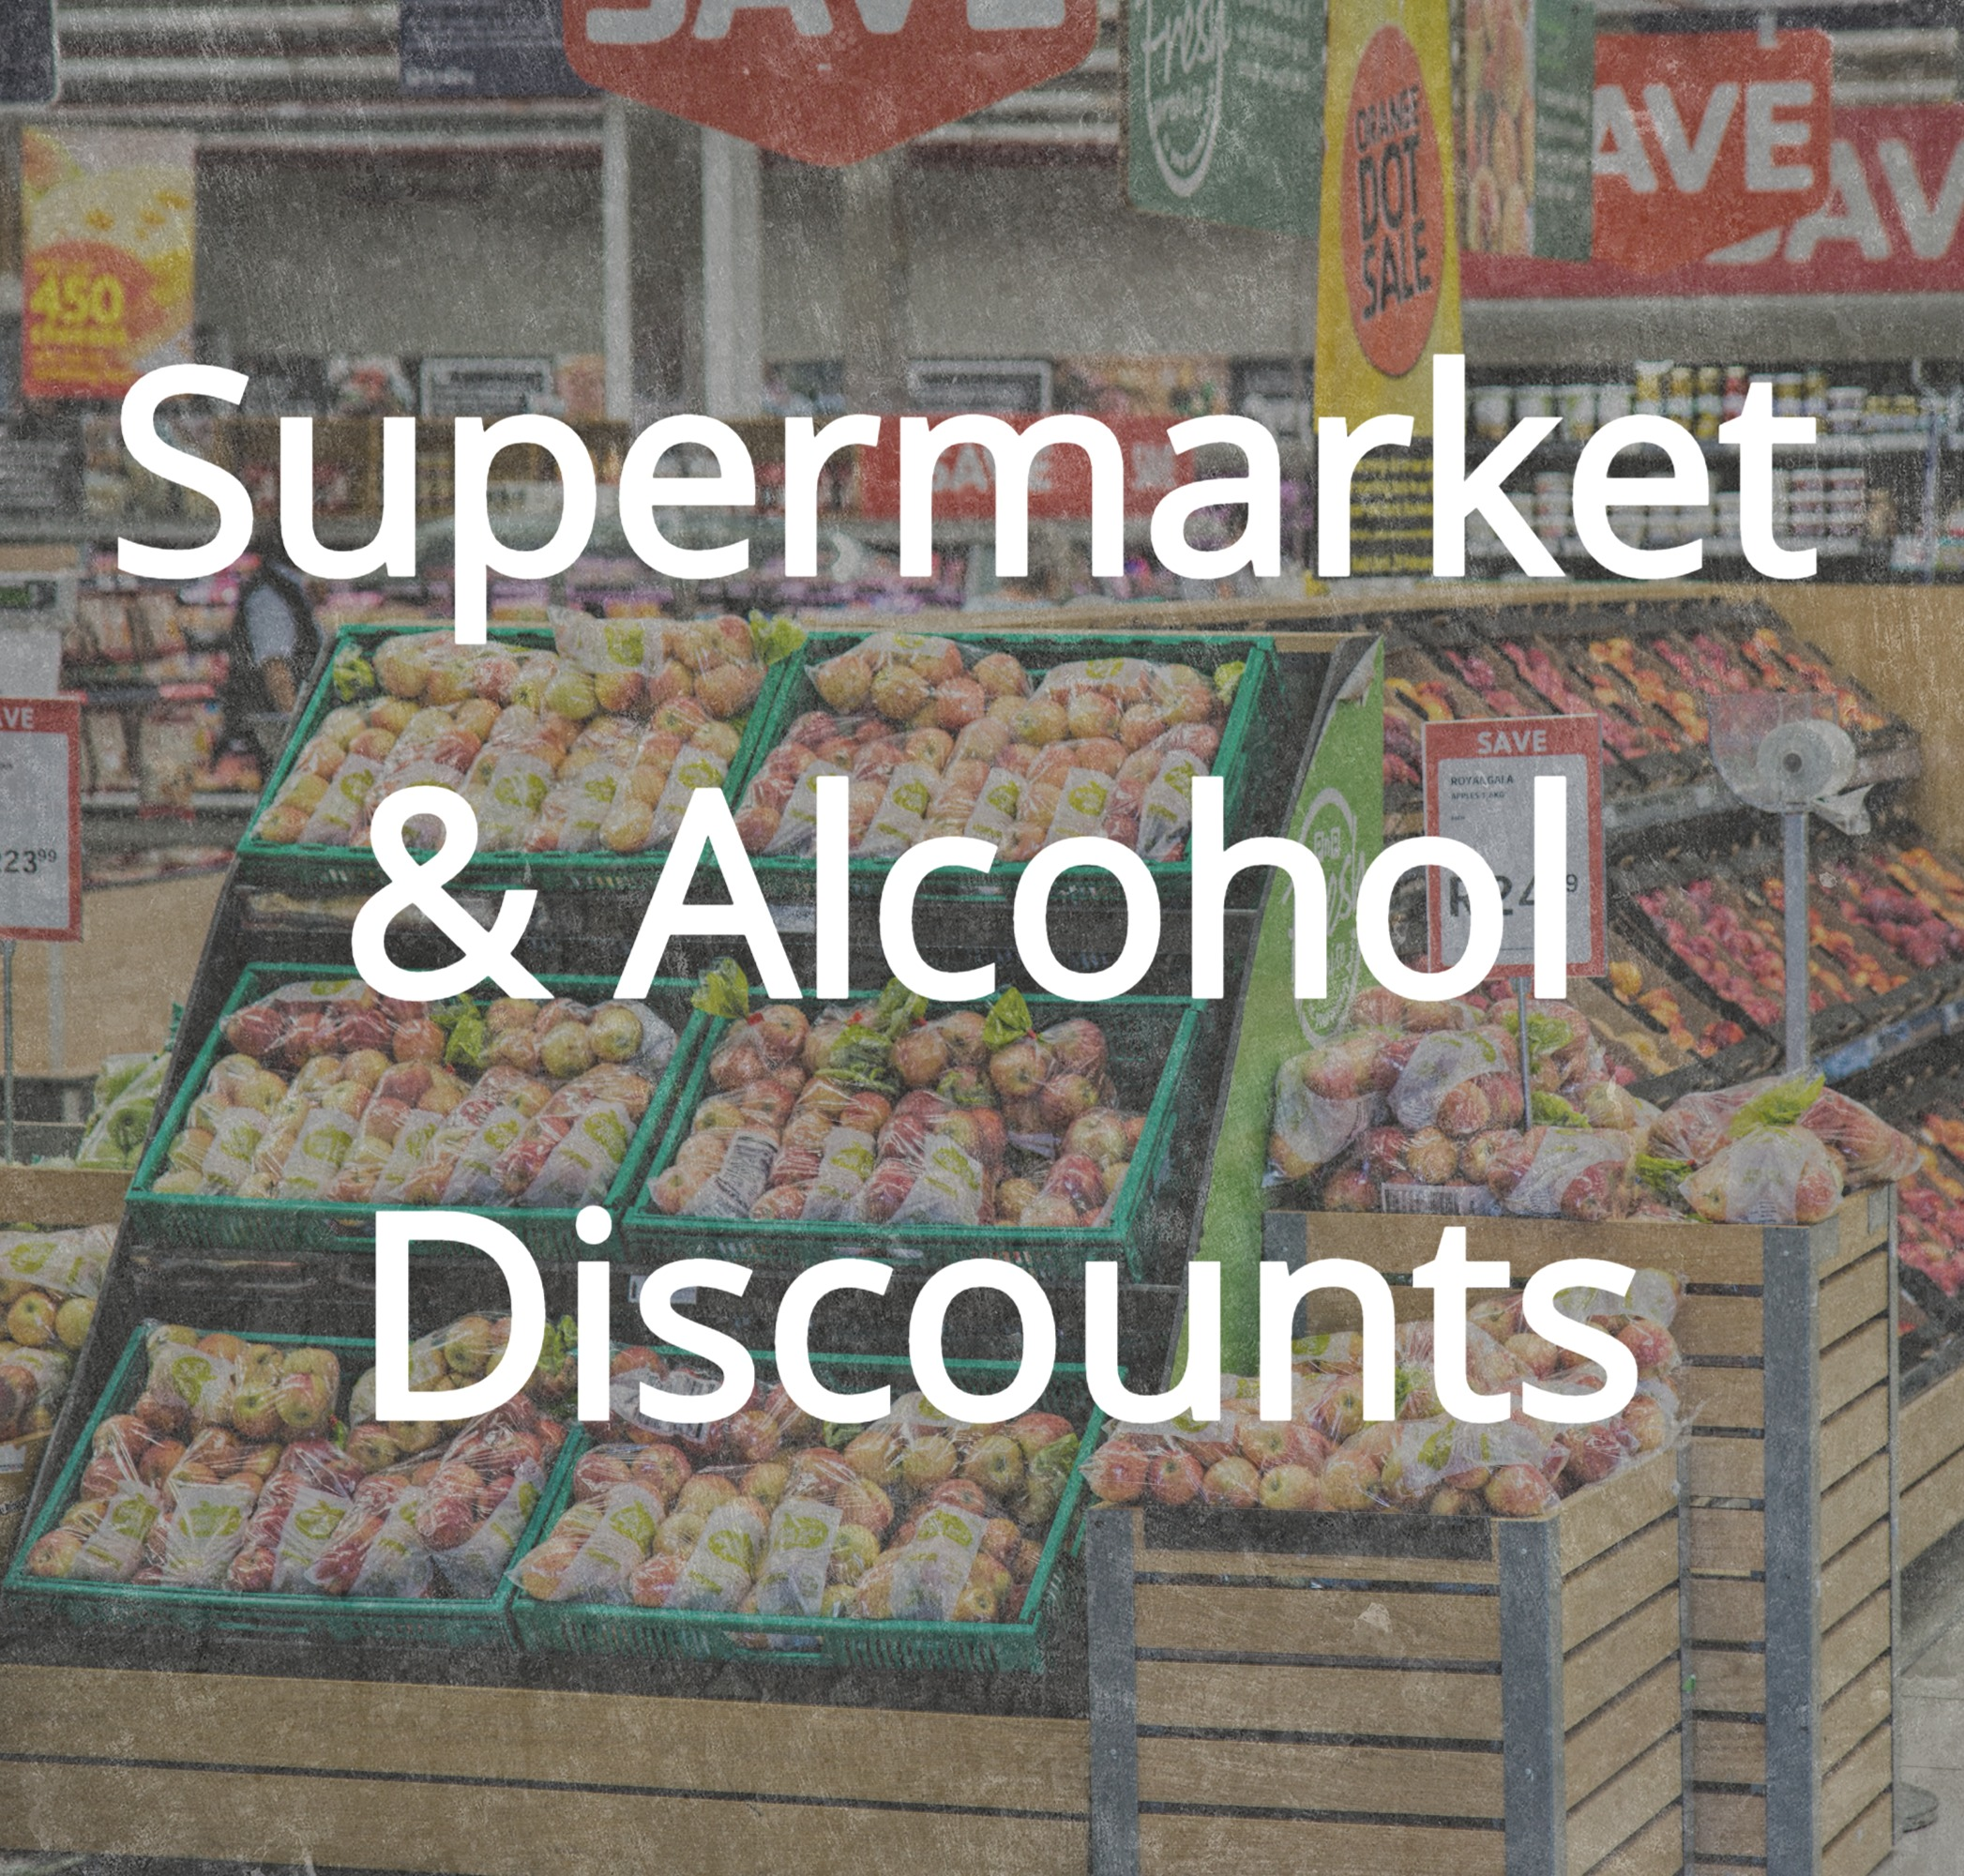 Supermarket & Alcohol discounts